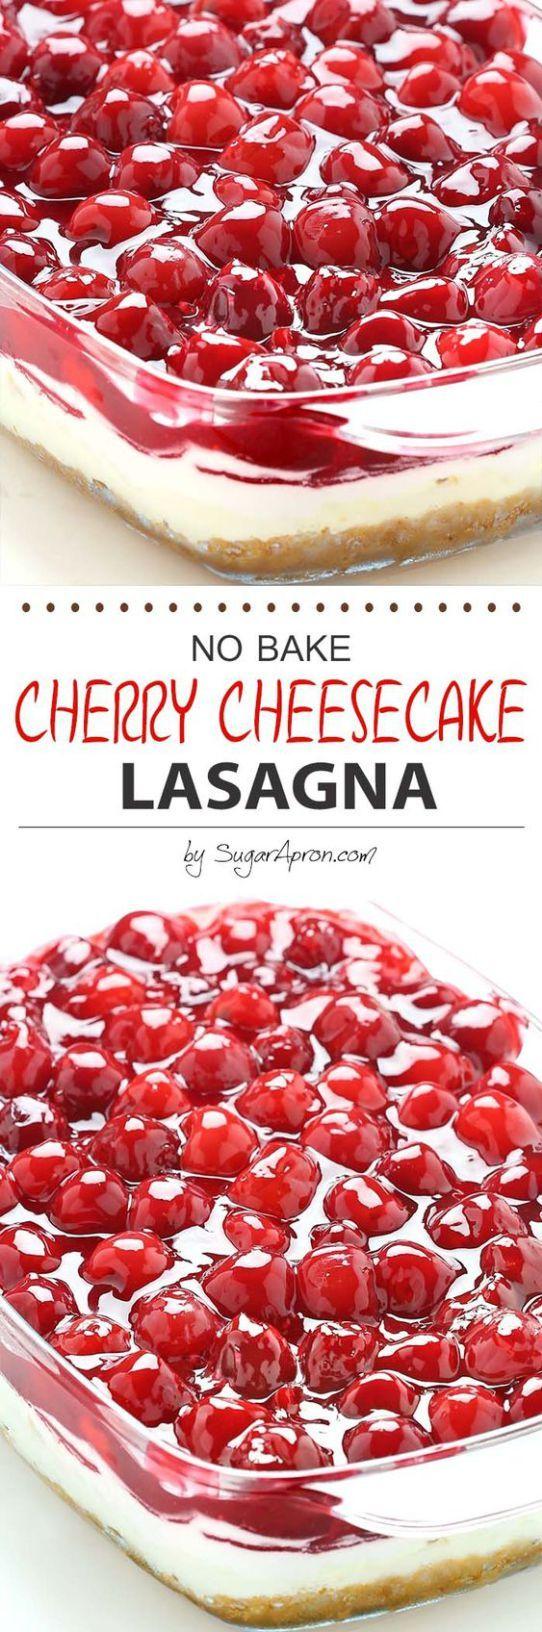 No Bake Cherry Tvarohový dezert Lasagne recept cez Sugar Zástera - Dezert lasagne s Grahamom krakovania kôry, smotanovým syrom náplň, pekanové orechy a čerešňový koláč polevou.